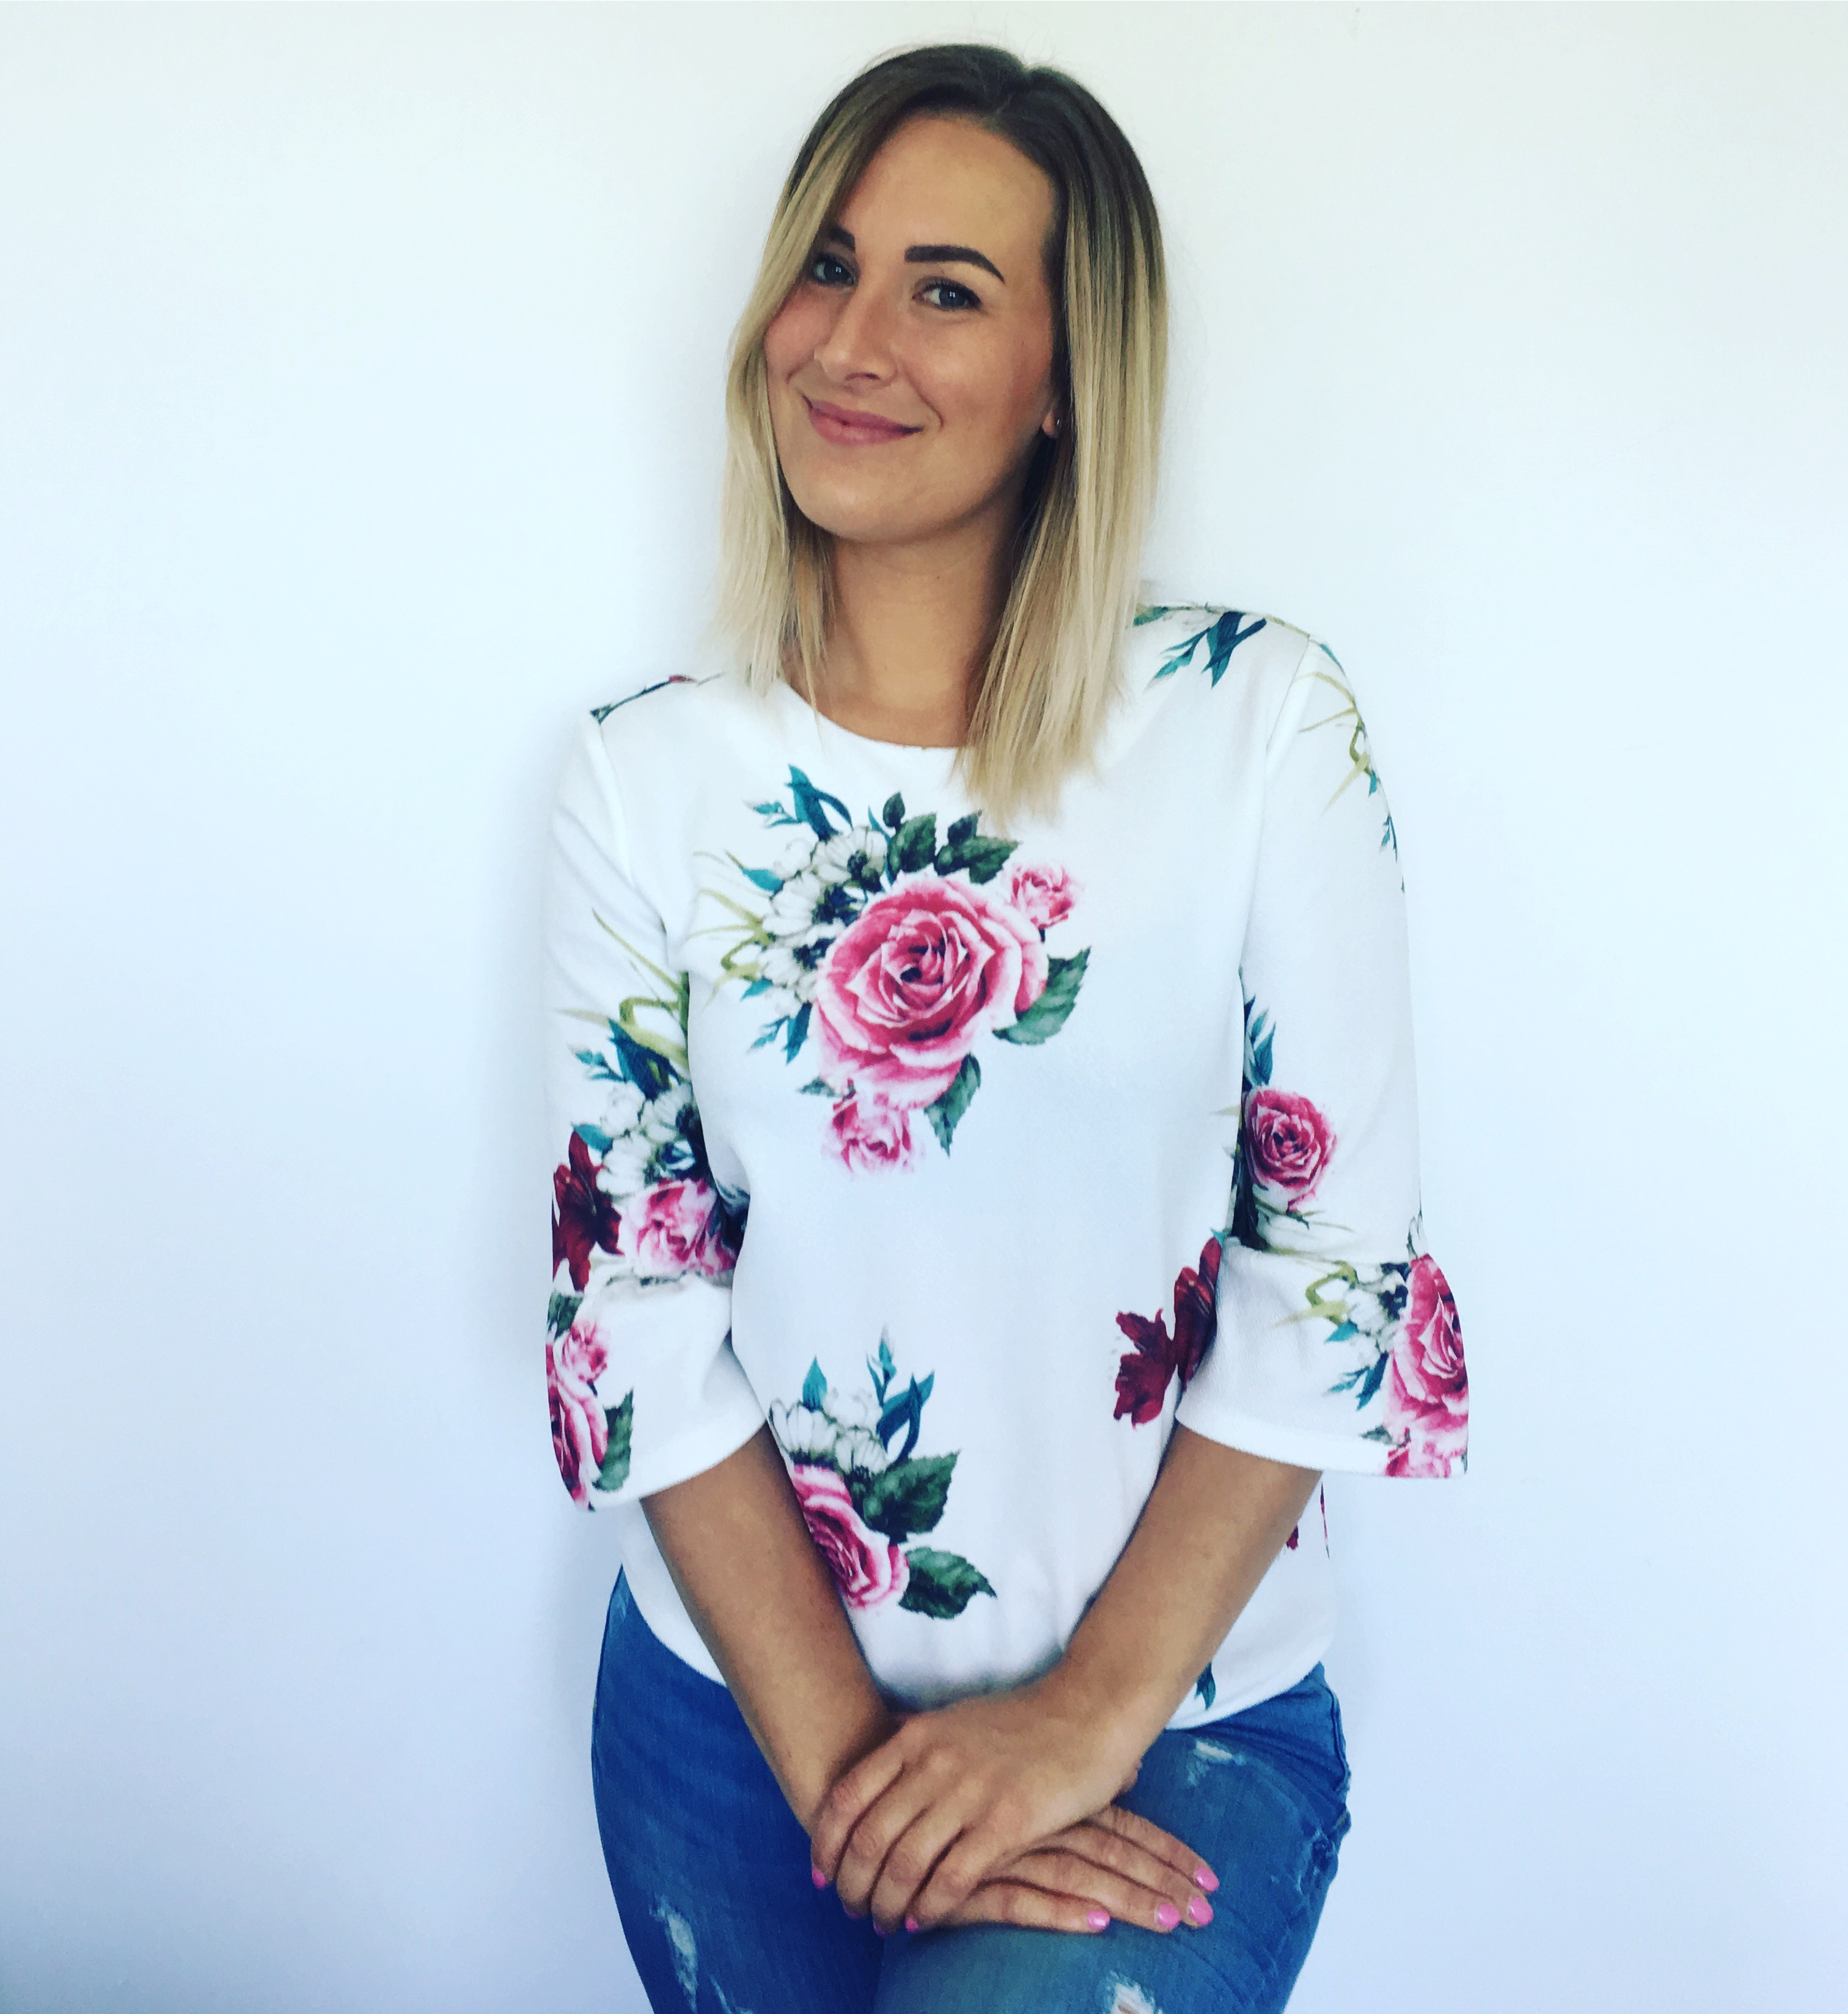 Lisanne - Your Weddingplanner